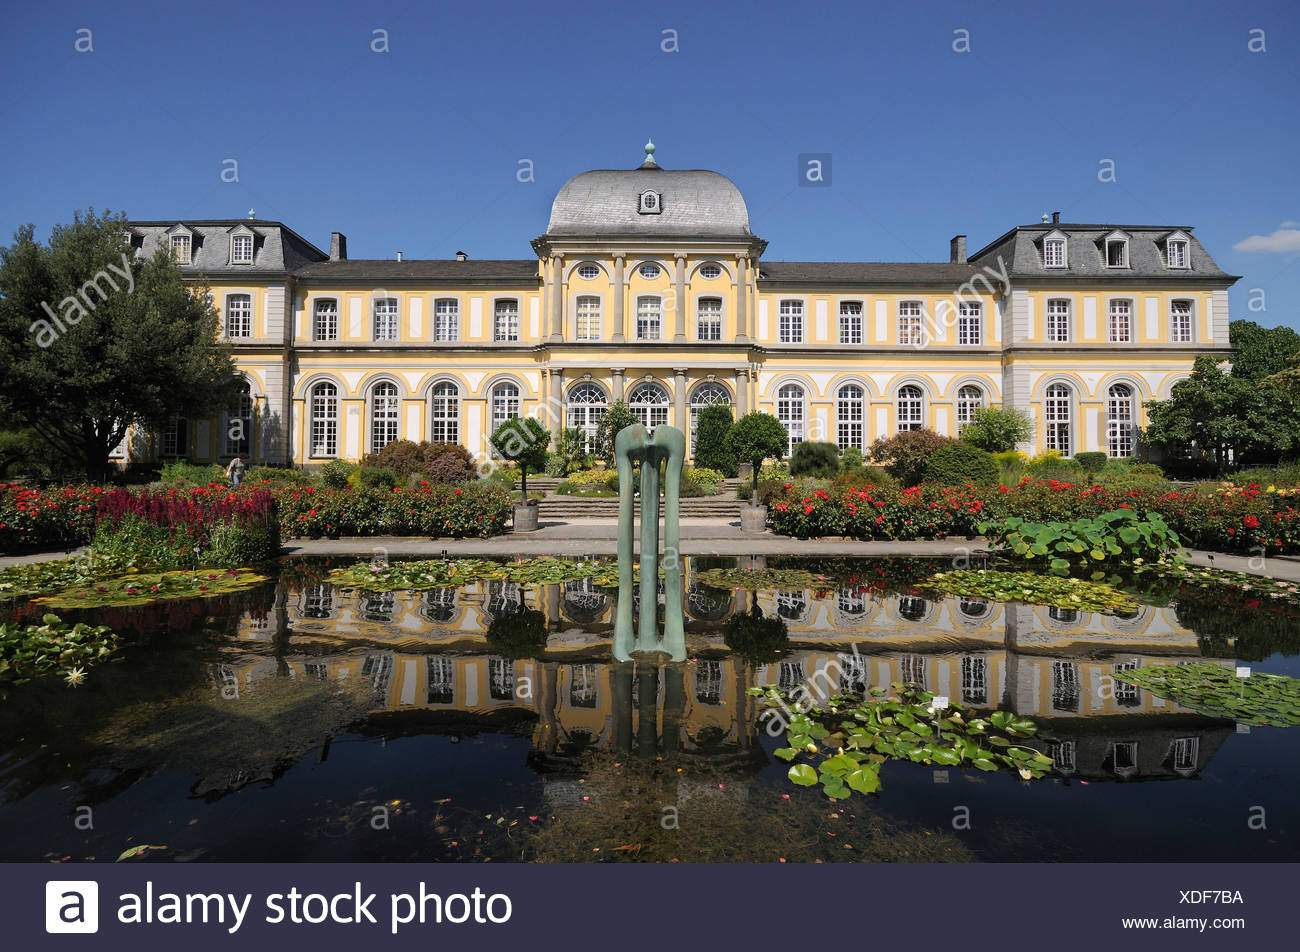 Botanischer Garten Bonn Elegant Botanischer Garten Bonn Poppelsdorf Bonn nordrhein